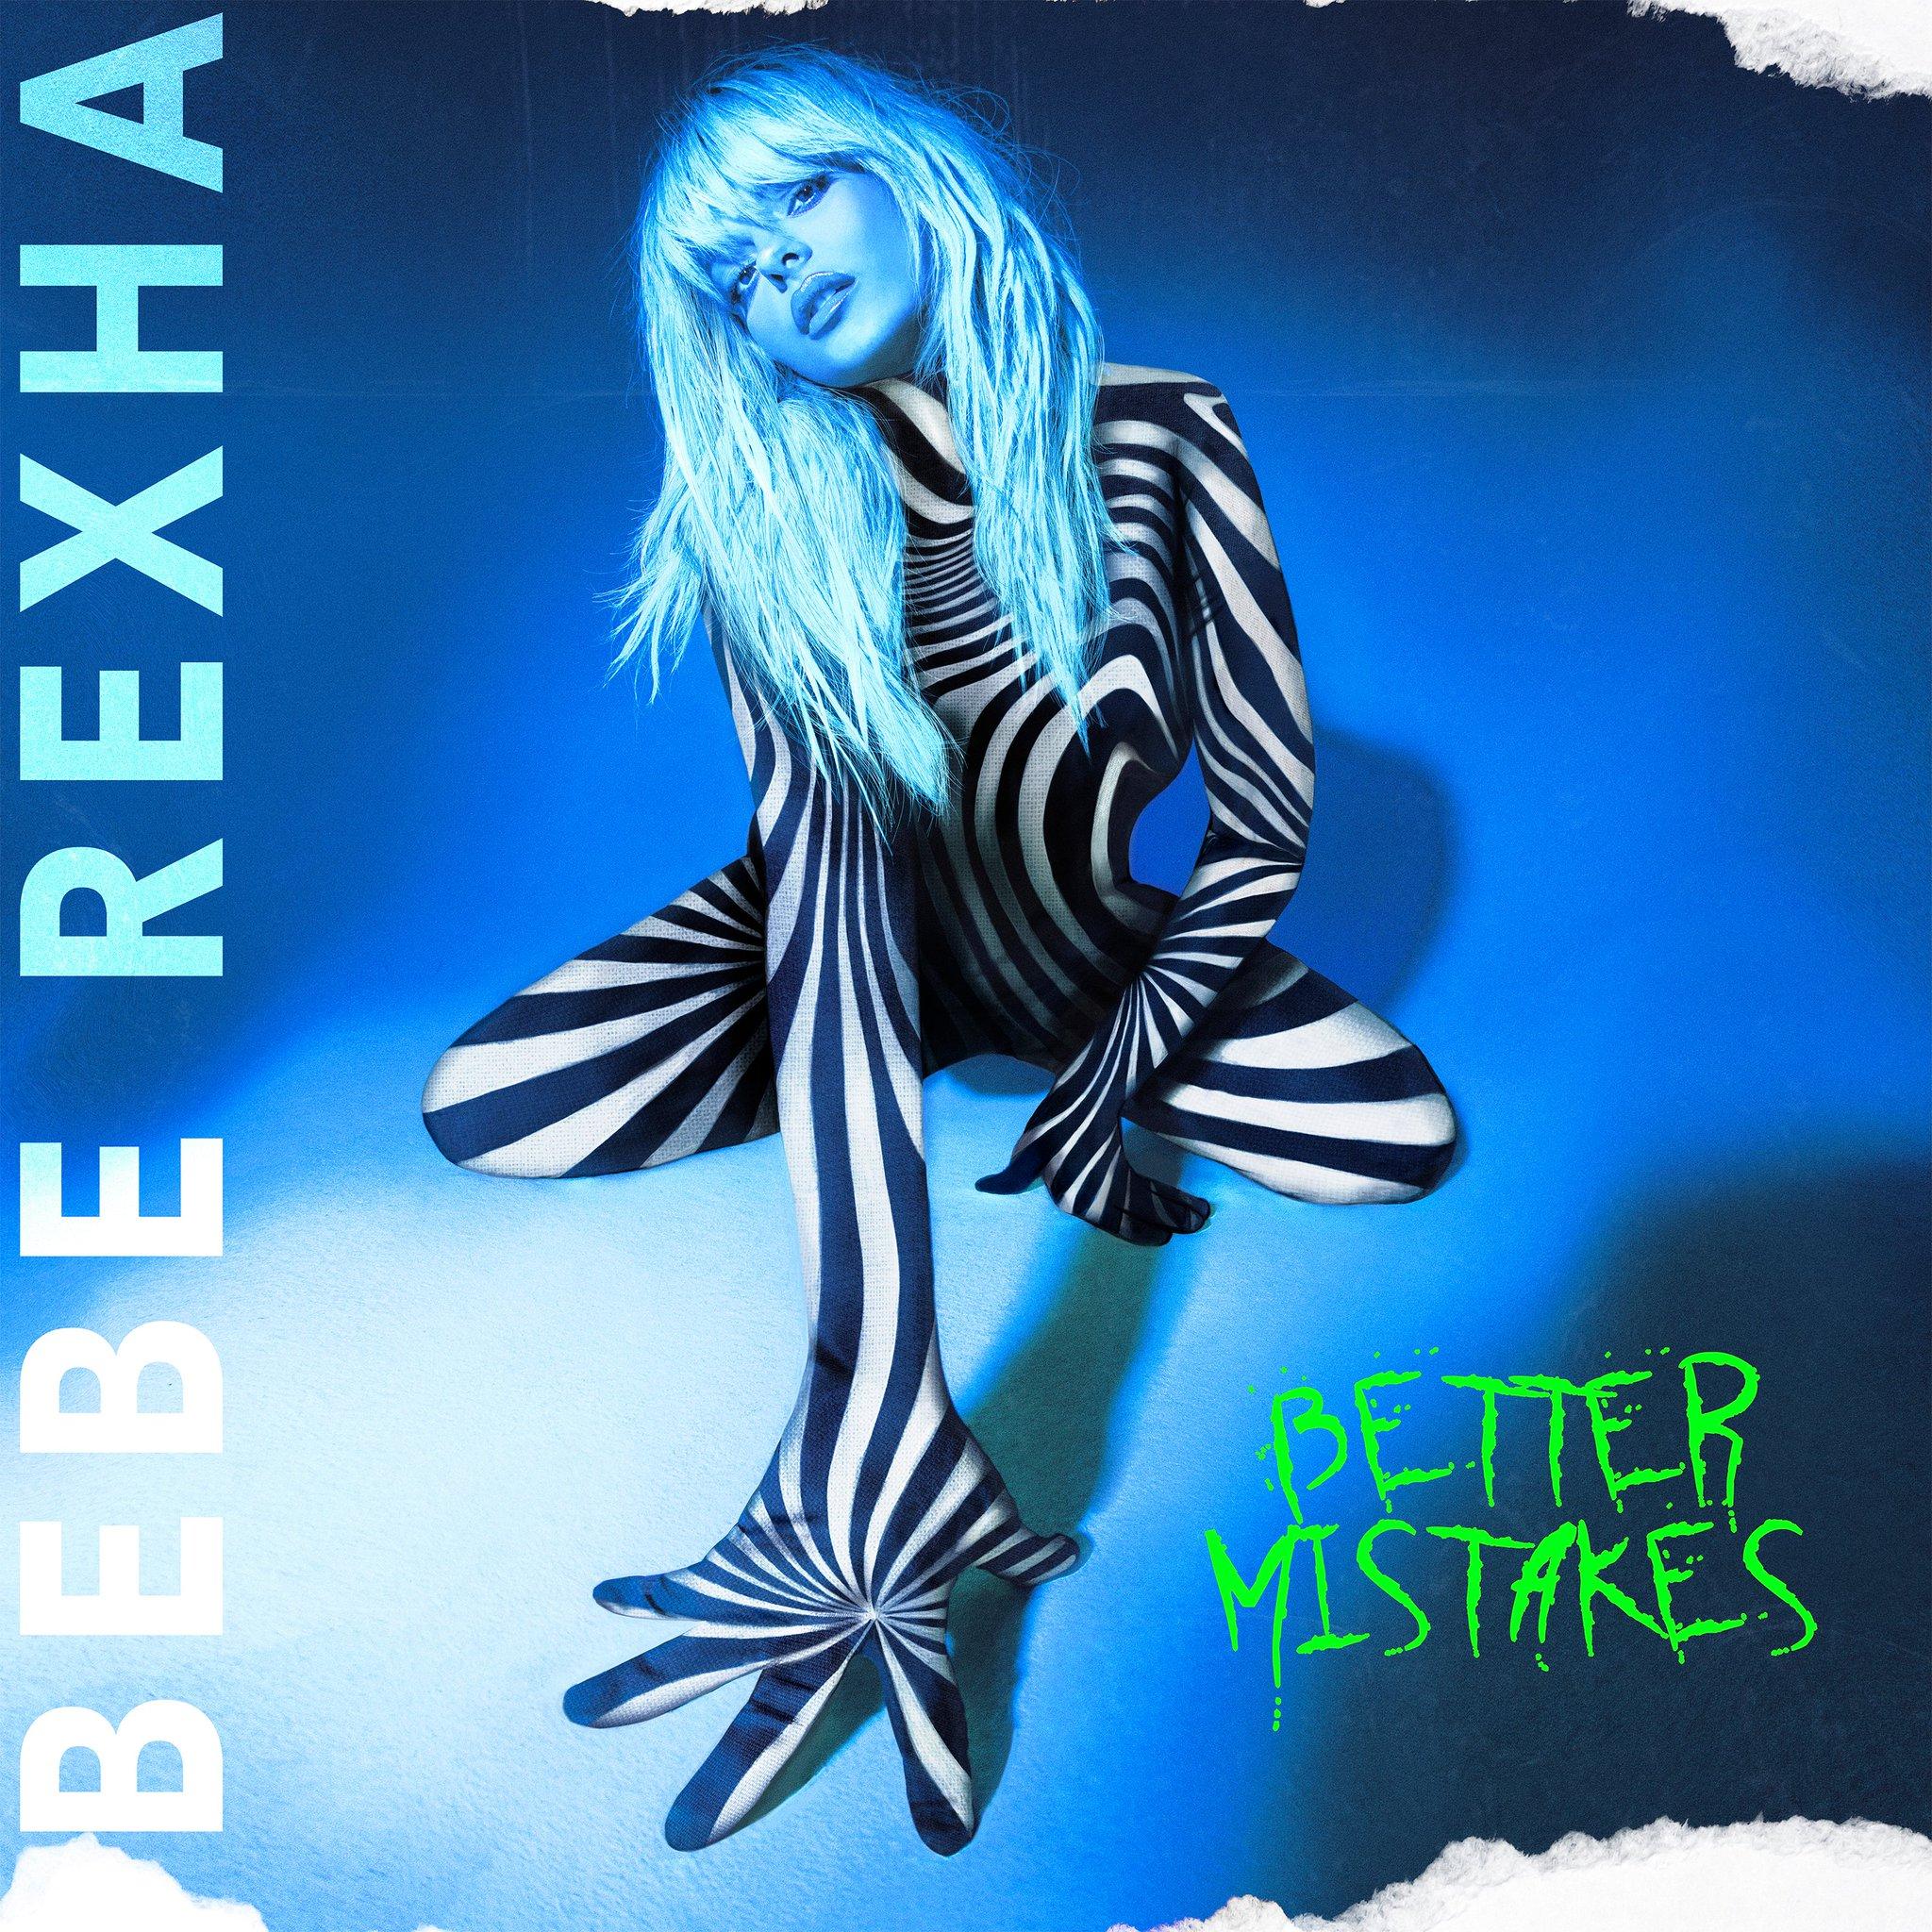 bebe rexha artwork album better mistakes